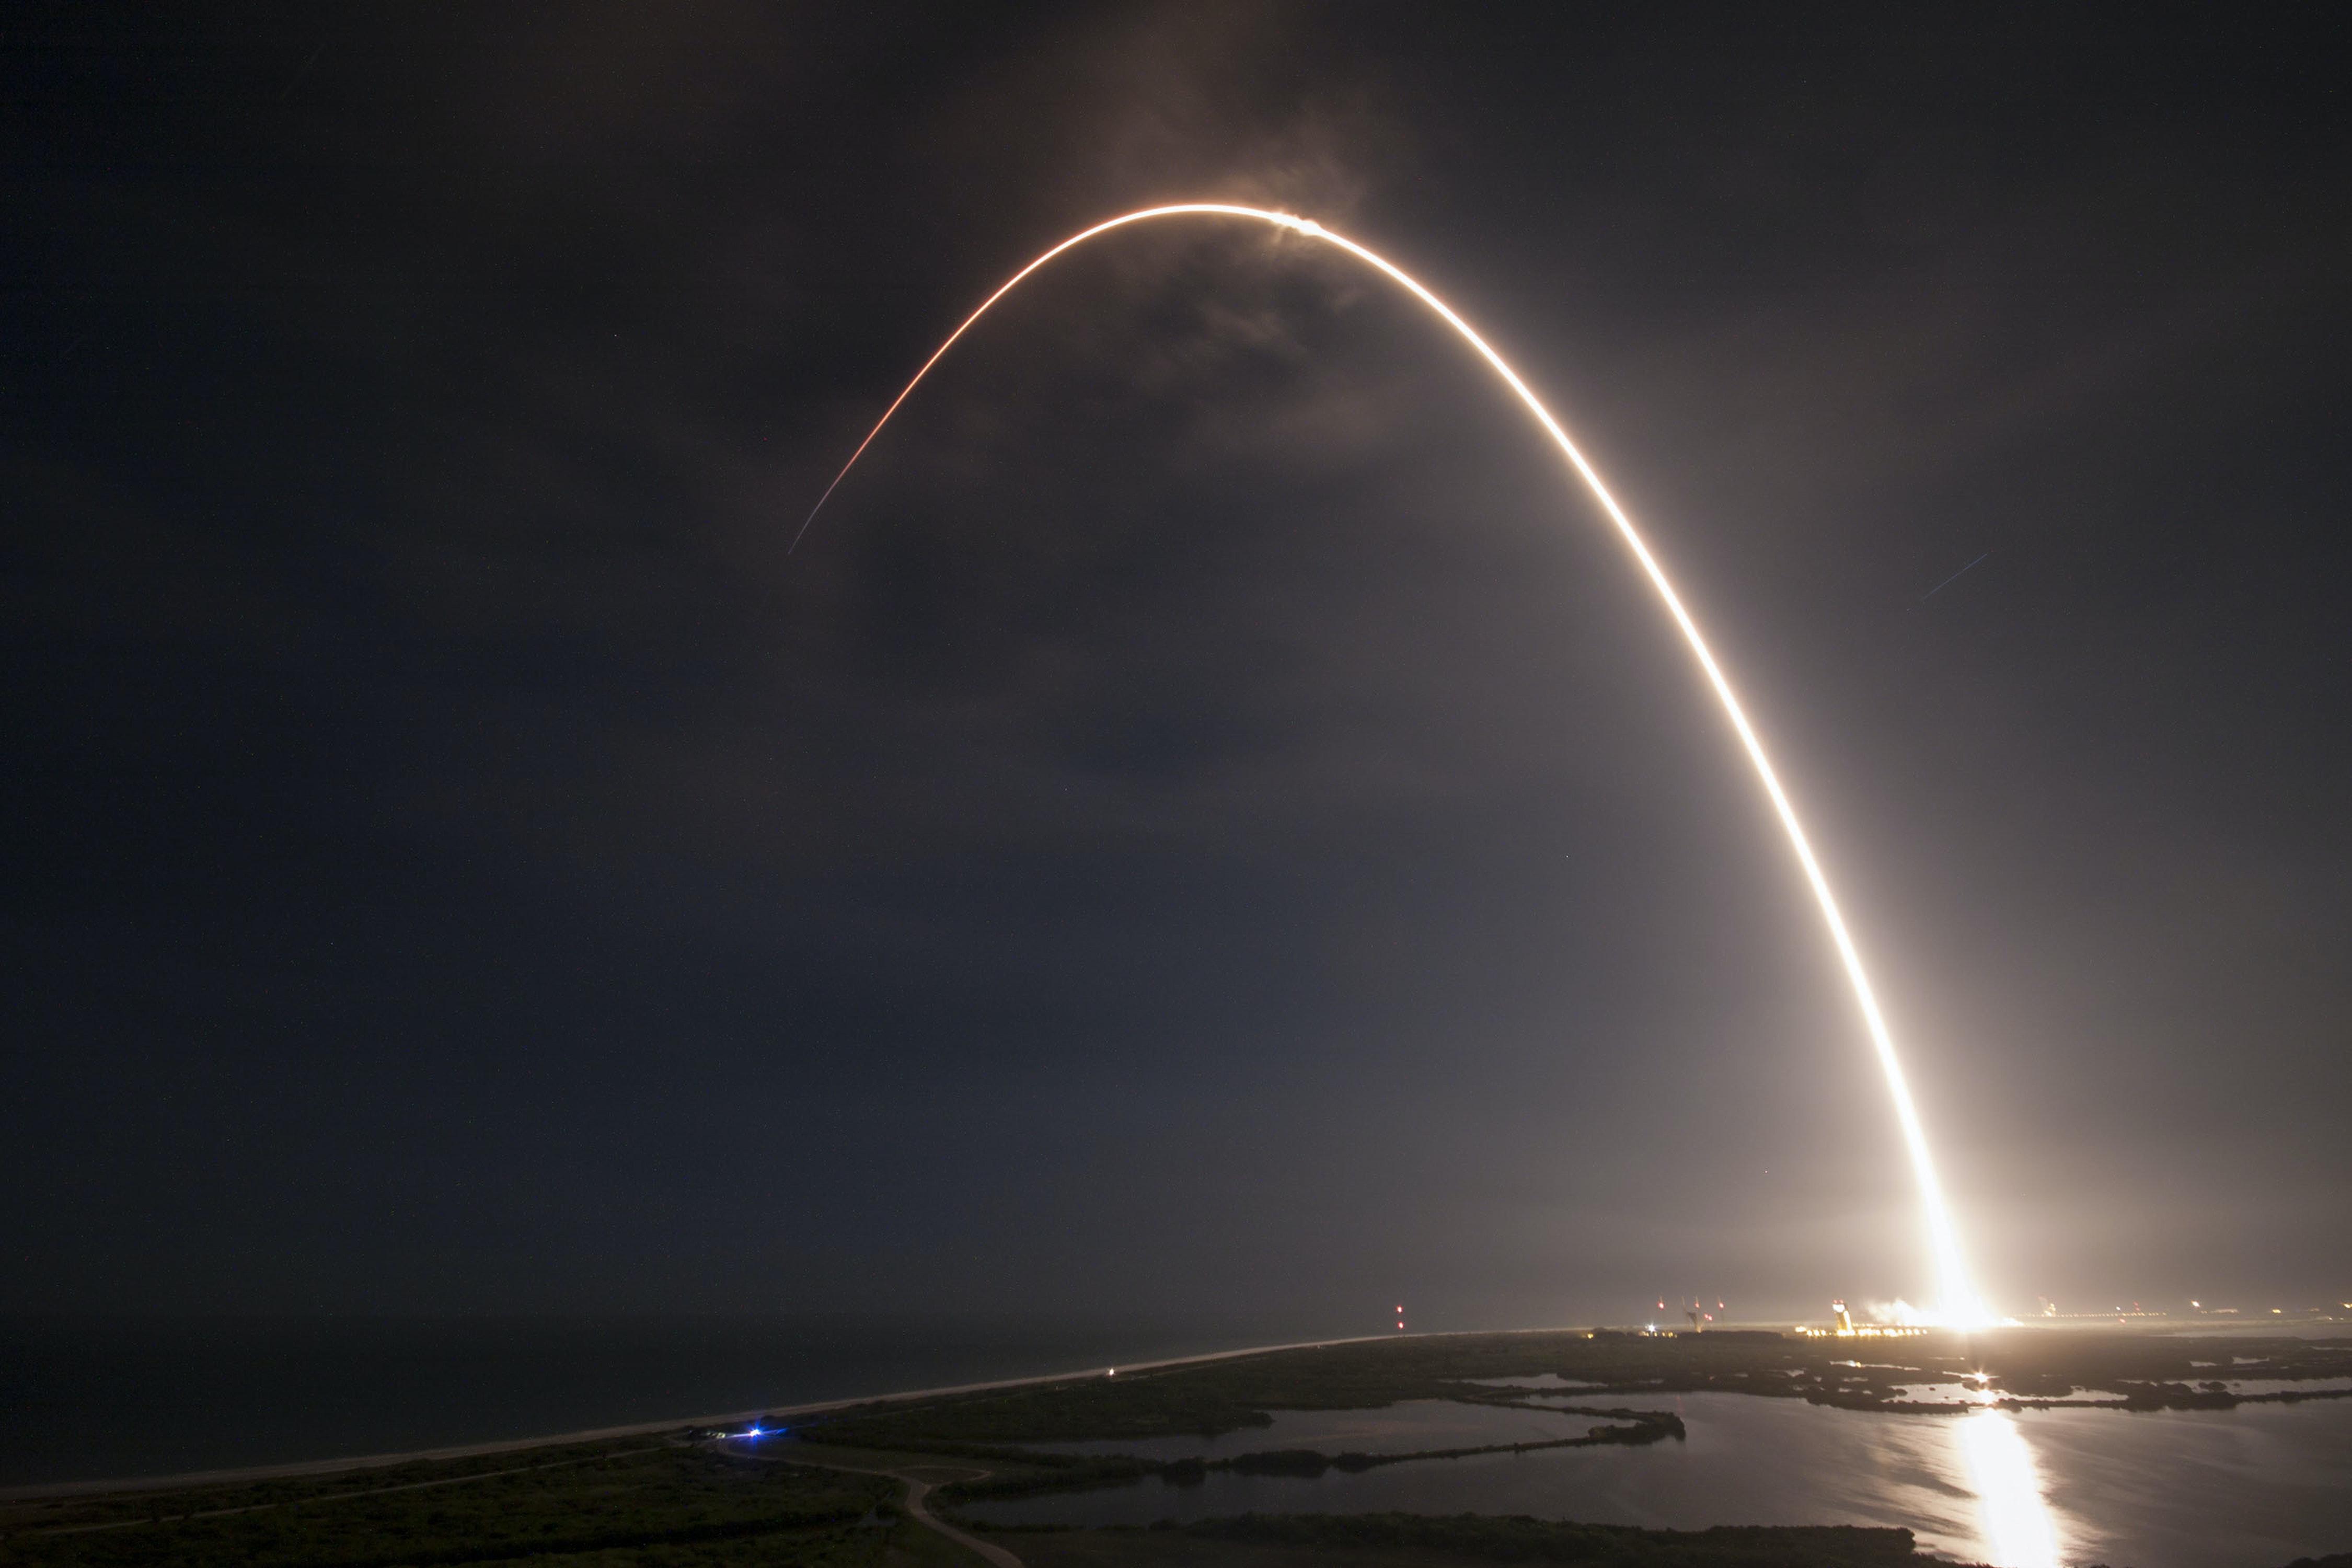 Falcon 9 Launch Trajectory